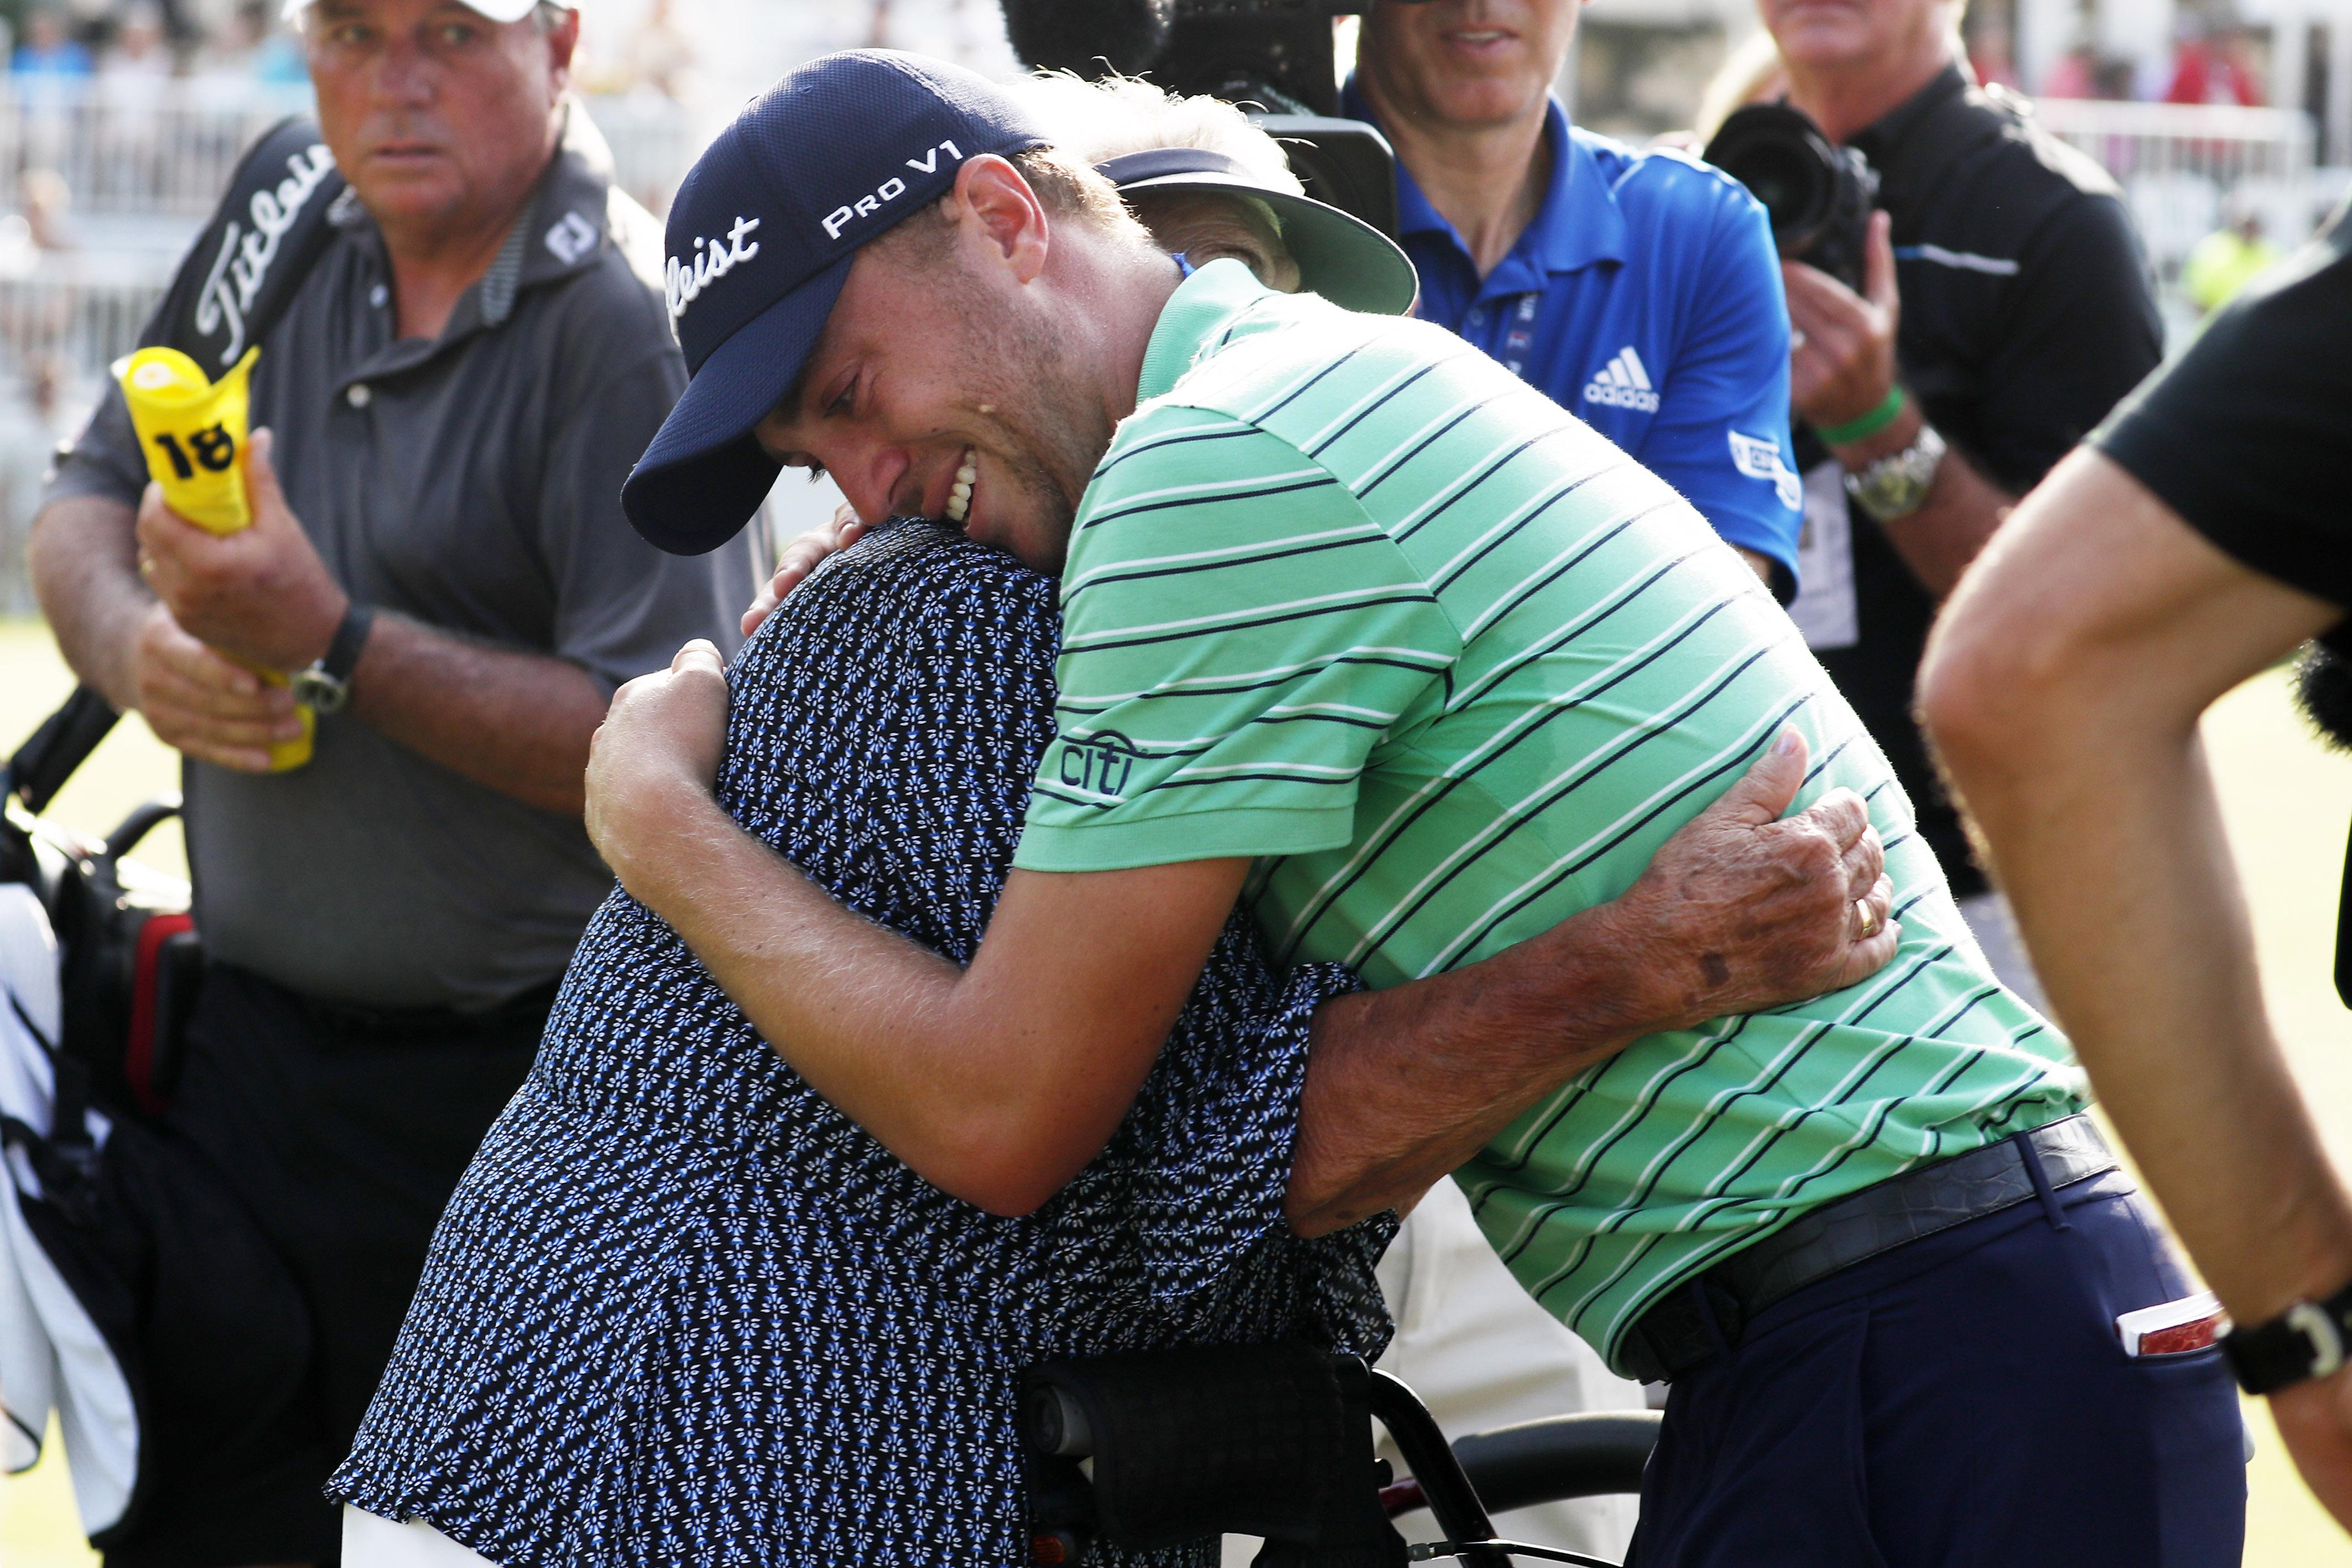 Aug 5, 2018; Akron, OH, USA; PGA golfer Justin Thomas hugs his grandmother after winning the WGC - Bridgestone Invitational golf tournament at Firestone Country Club - South Course. Mandatory Credit: Brian Spurlock-USA TODAY Sports